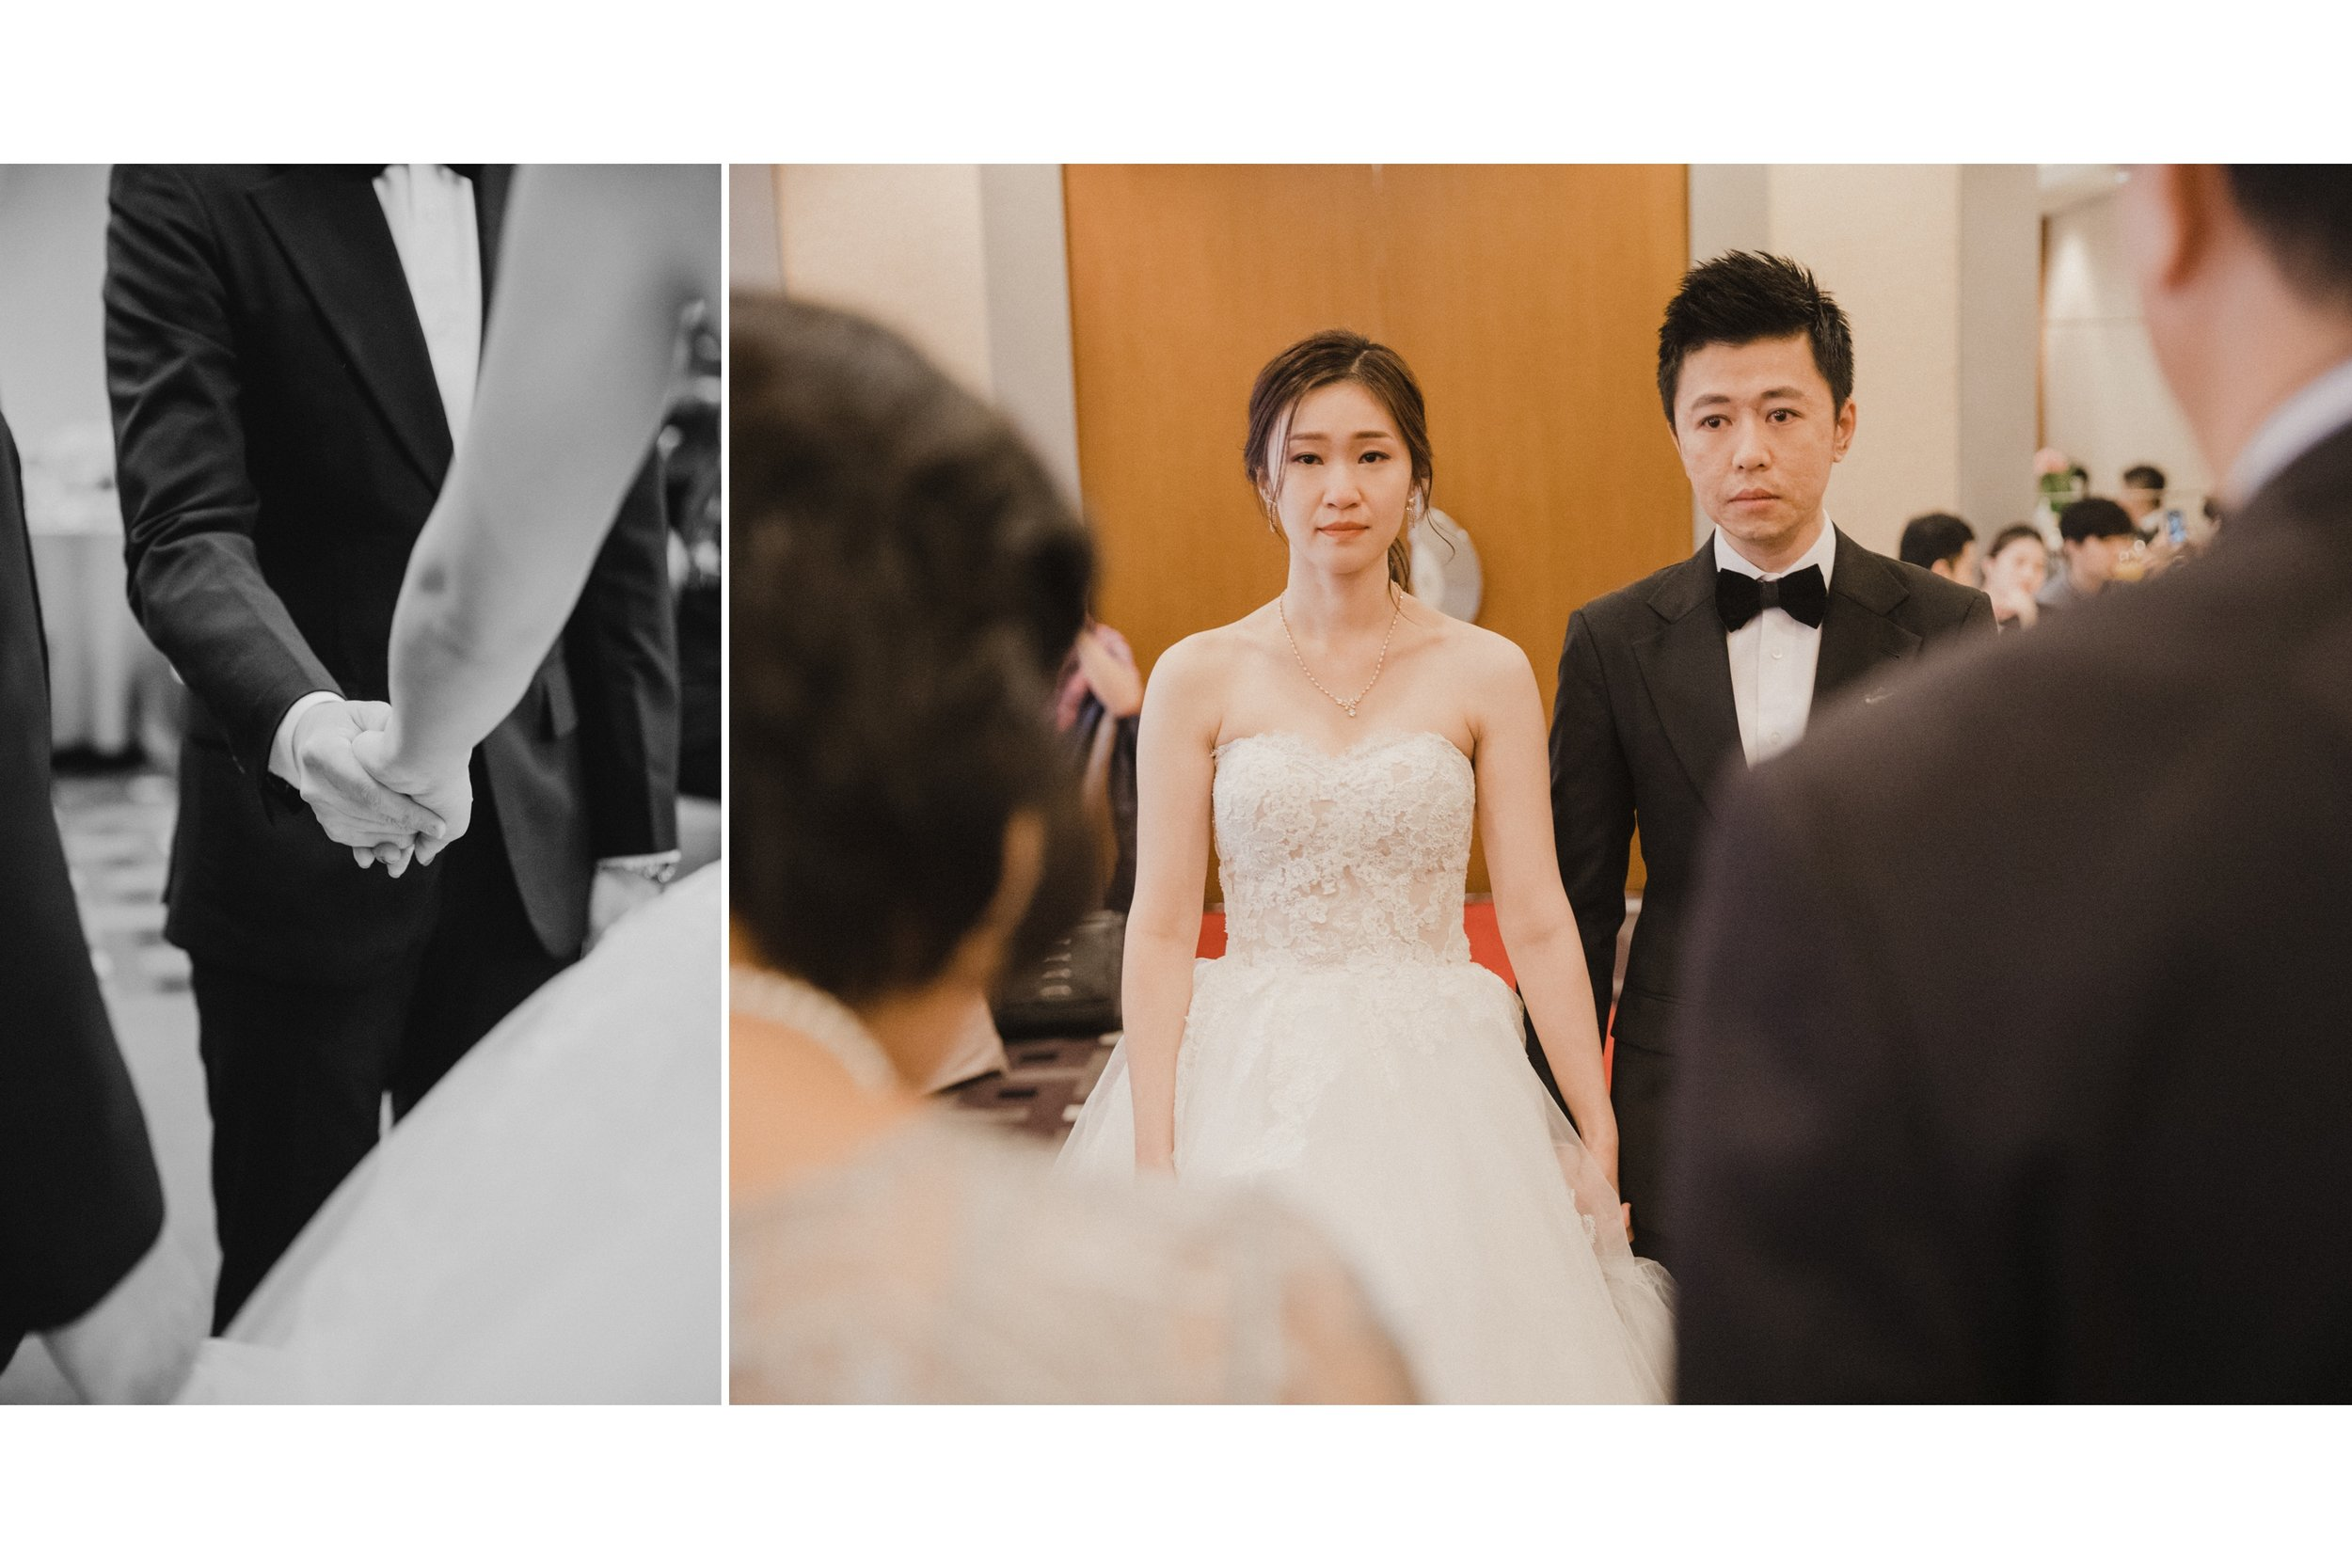 wedding-caridee-oscar-lunch-ambassador-hsinchu-結婚午宴-新竹國賓_74.jpg